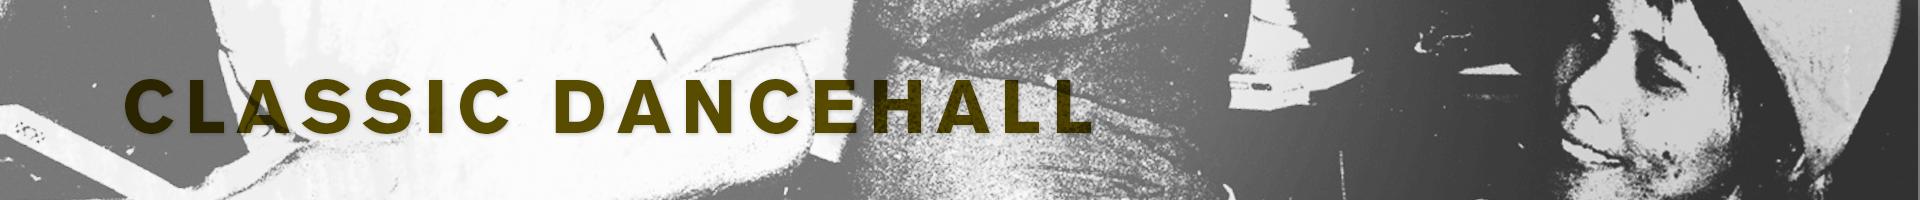 classic-dancehall-genre-banner.png